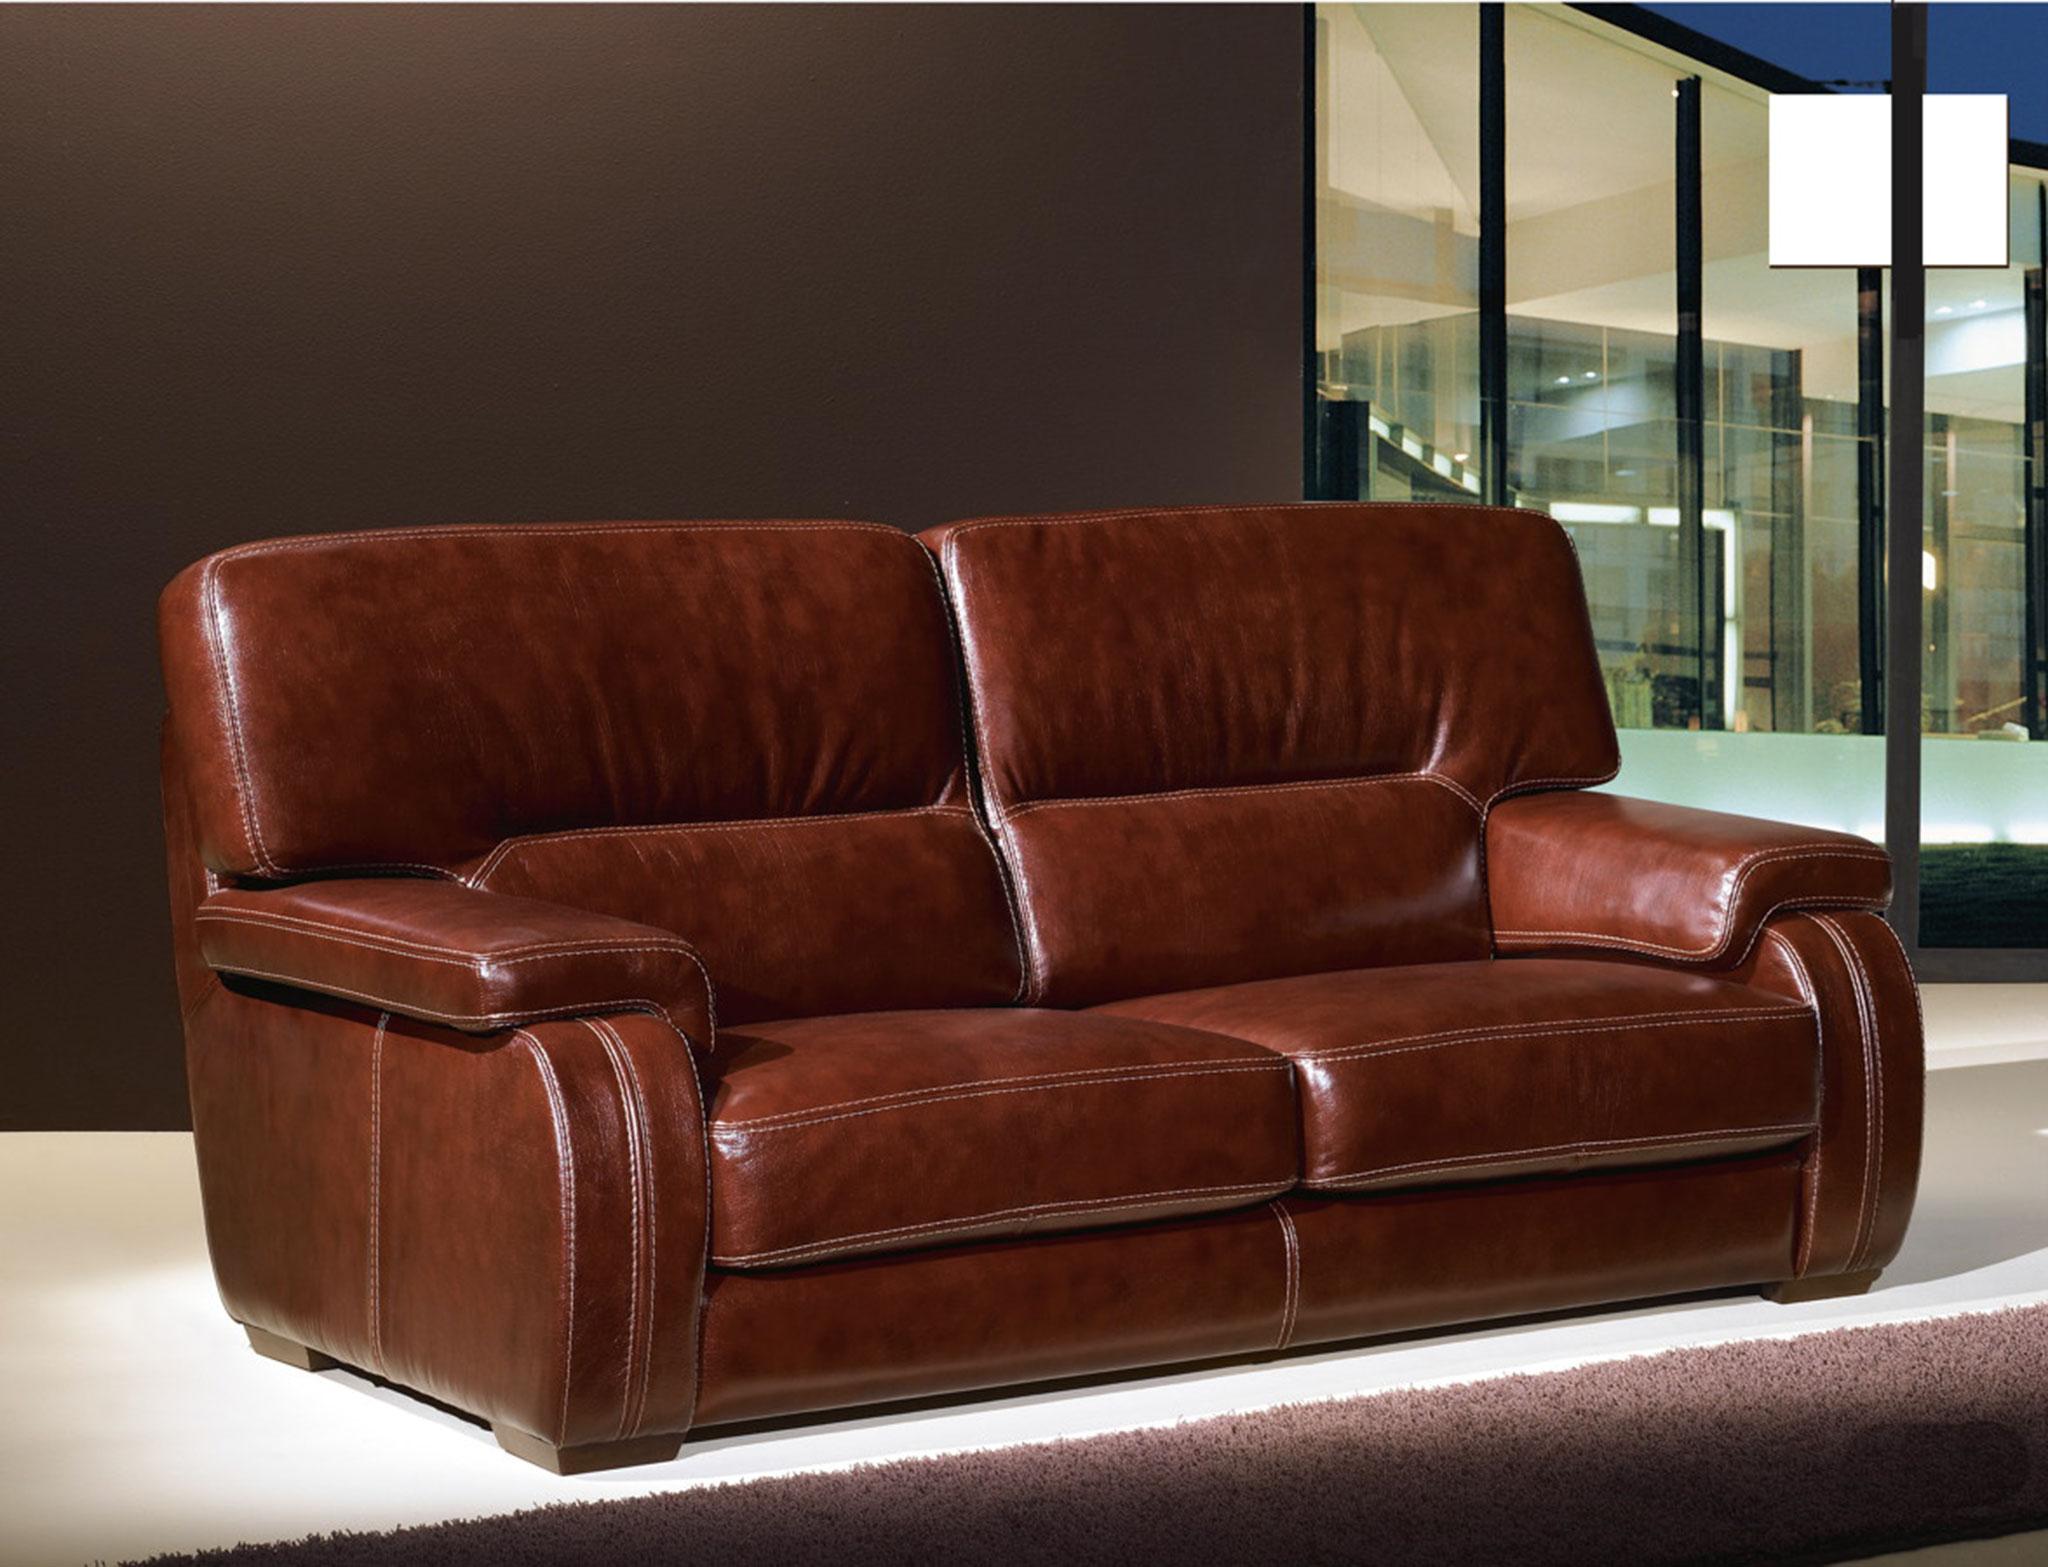 Salon De Jardin Americain salon en cuir fauteuil salon en cuir 20 – idées de